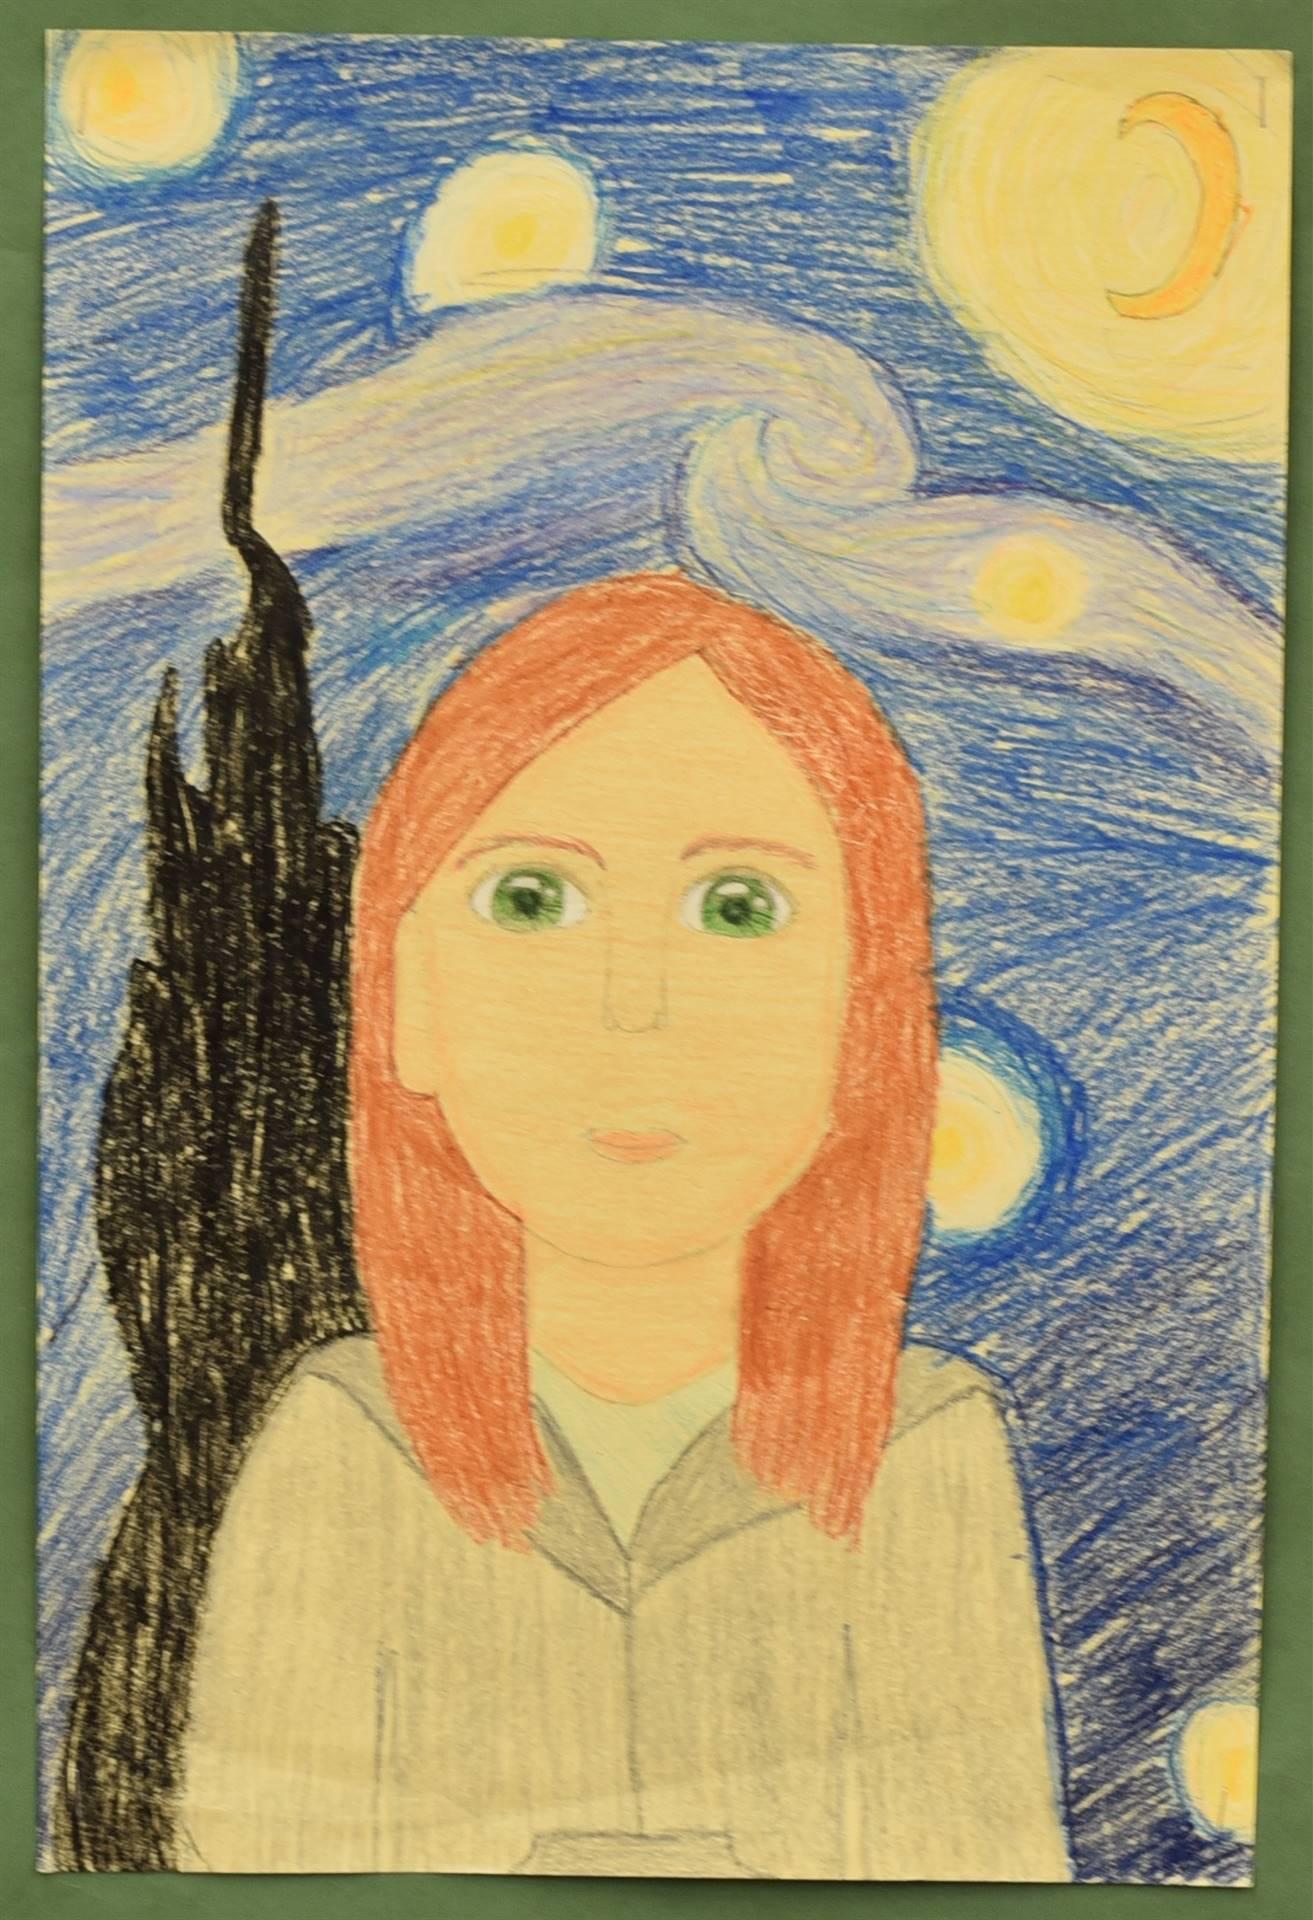 Brecksville-Broadview Hts. Middle School Art Projects 174